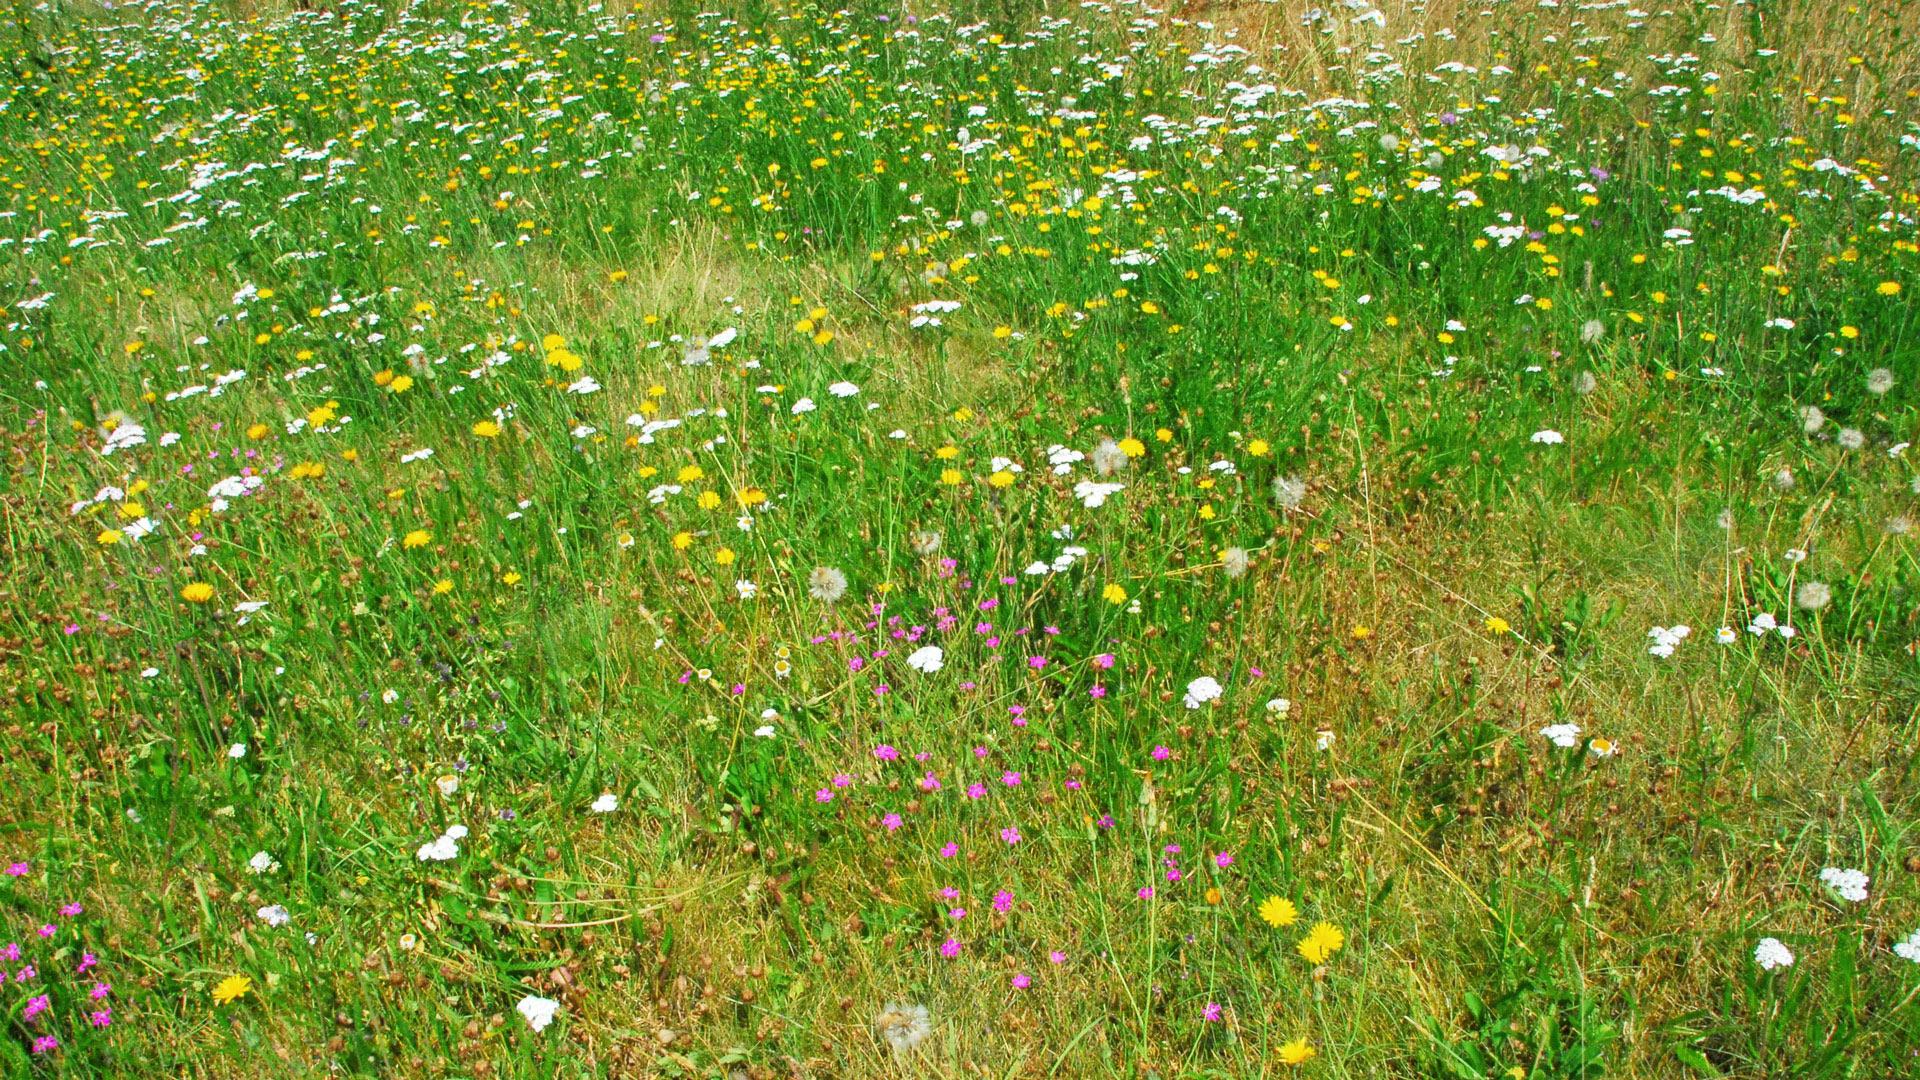 Gräser-Kräuter-Rasen